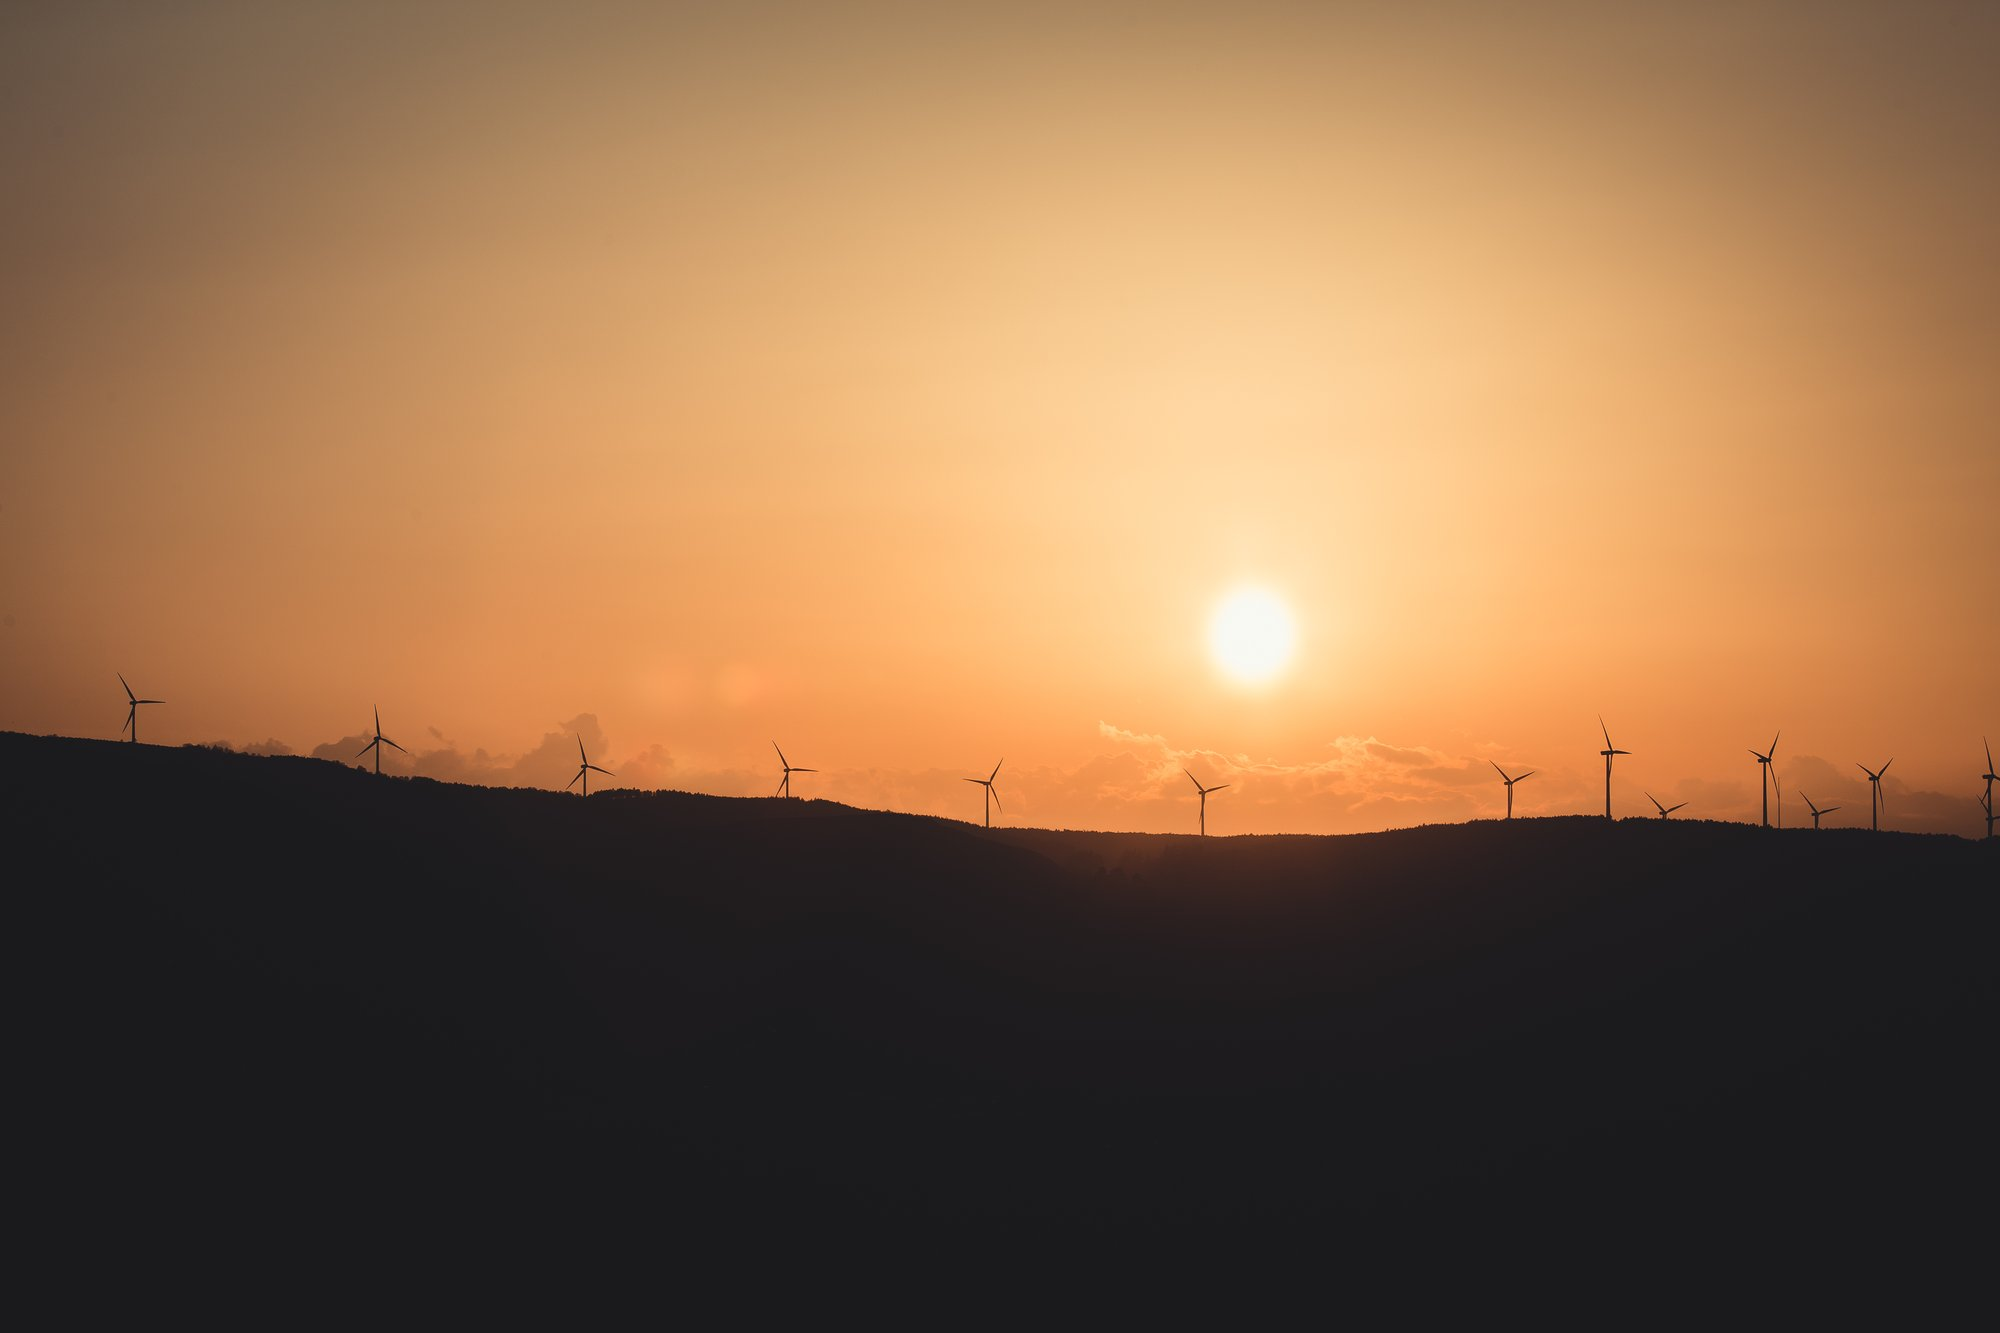 hazy sunset silhouettes landscape with windmills 朦胧的日落剪影带风车的风景